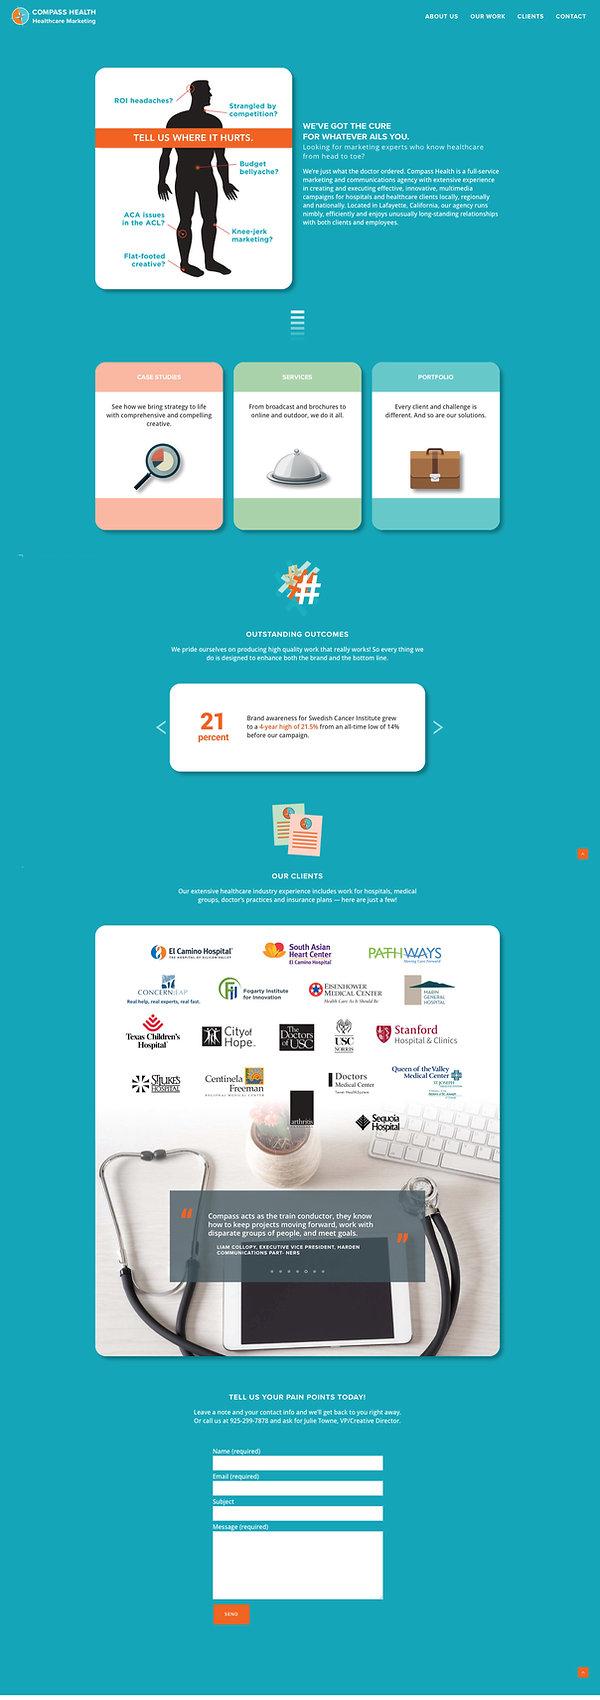 Web Design, Bay Area, Healthcare Advertising